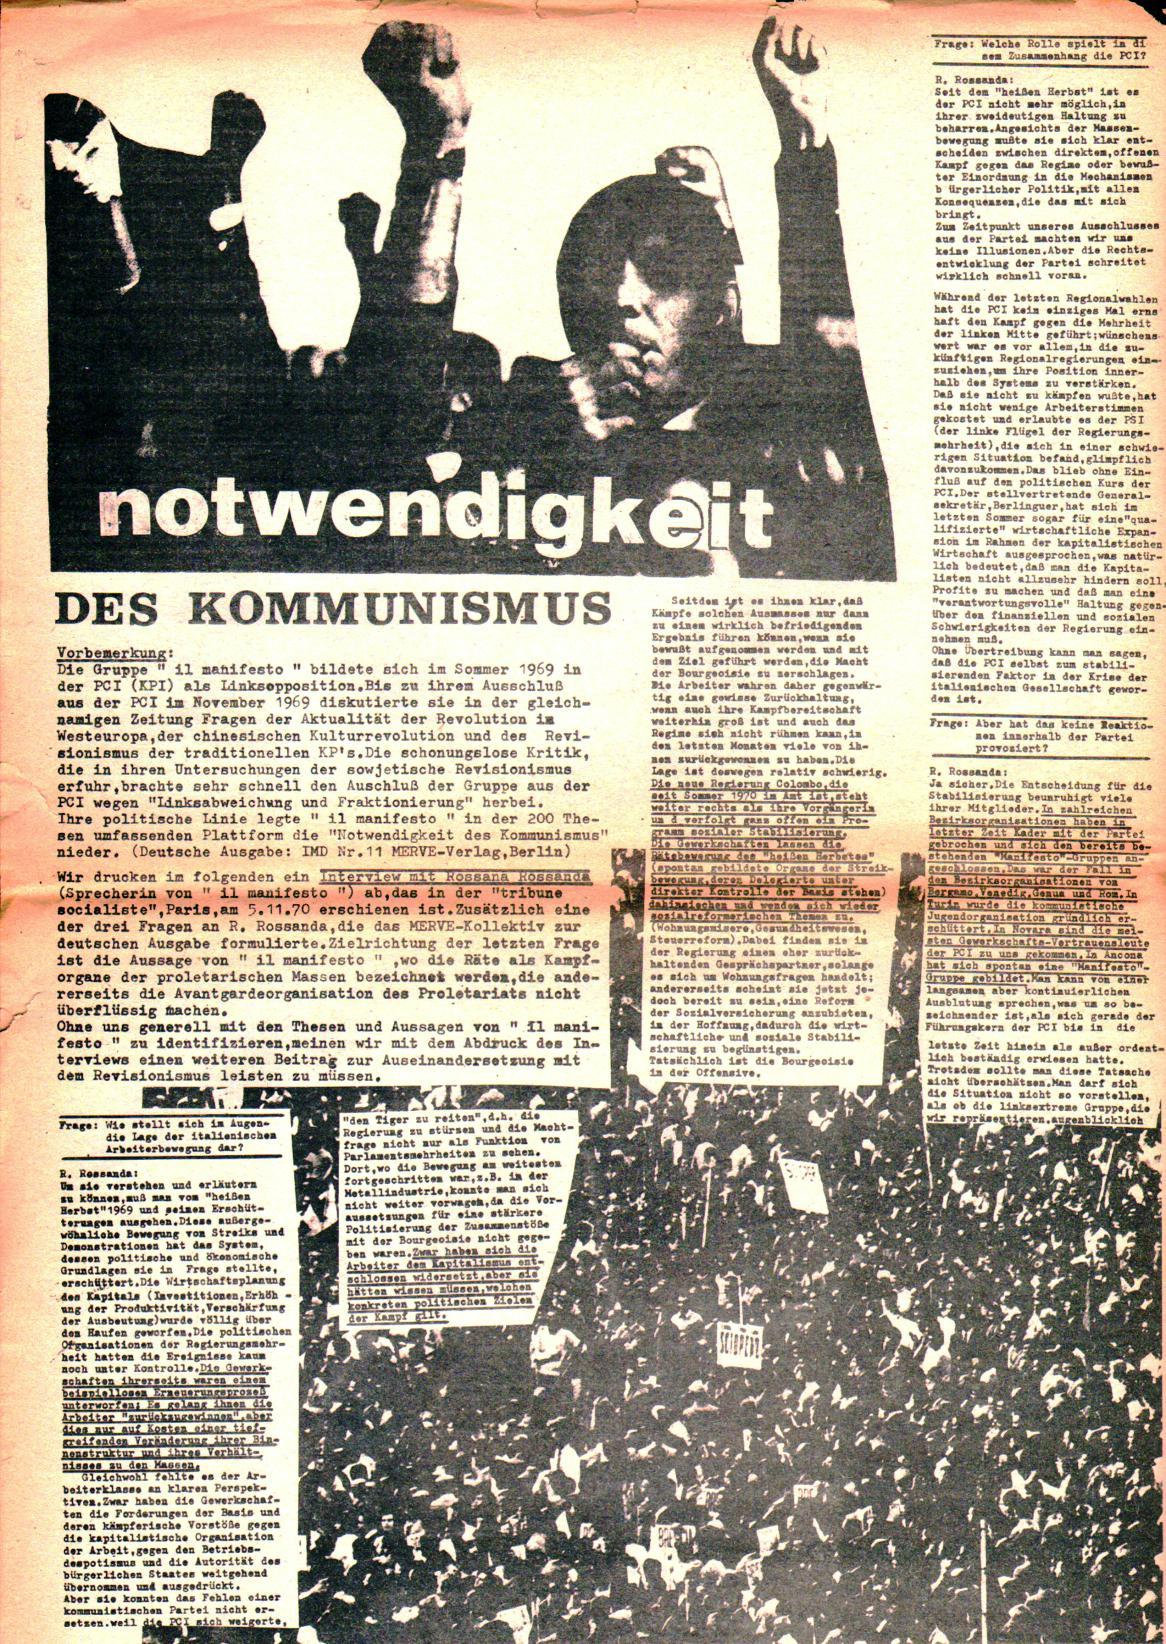 Berlin_Hochschulkampf_1971_03_10